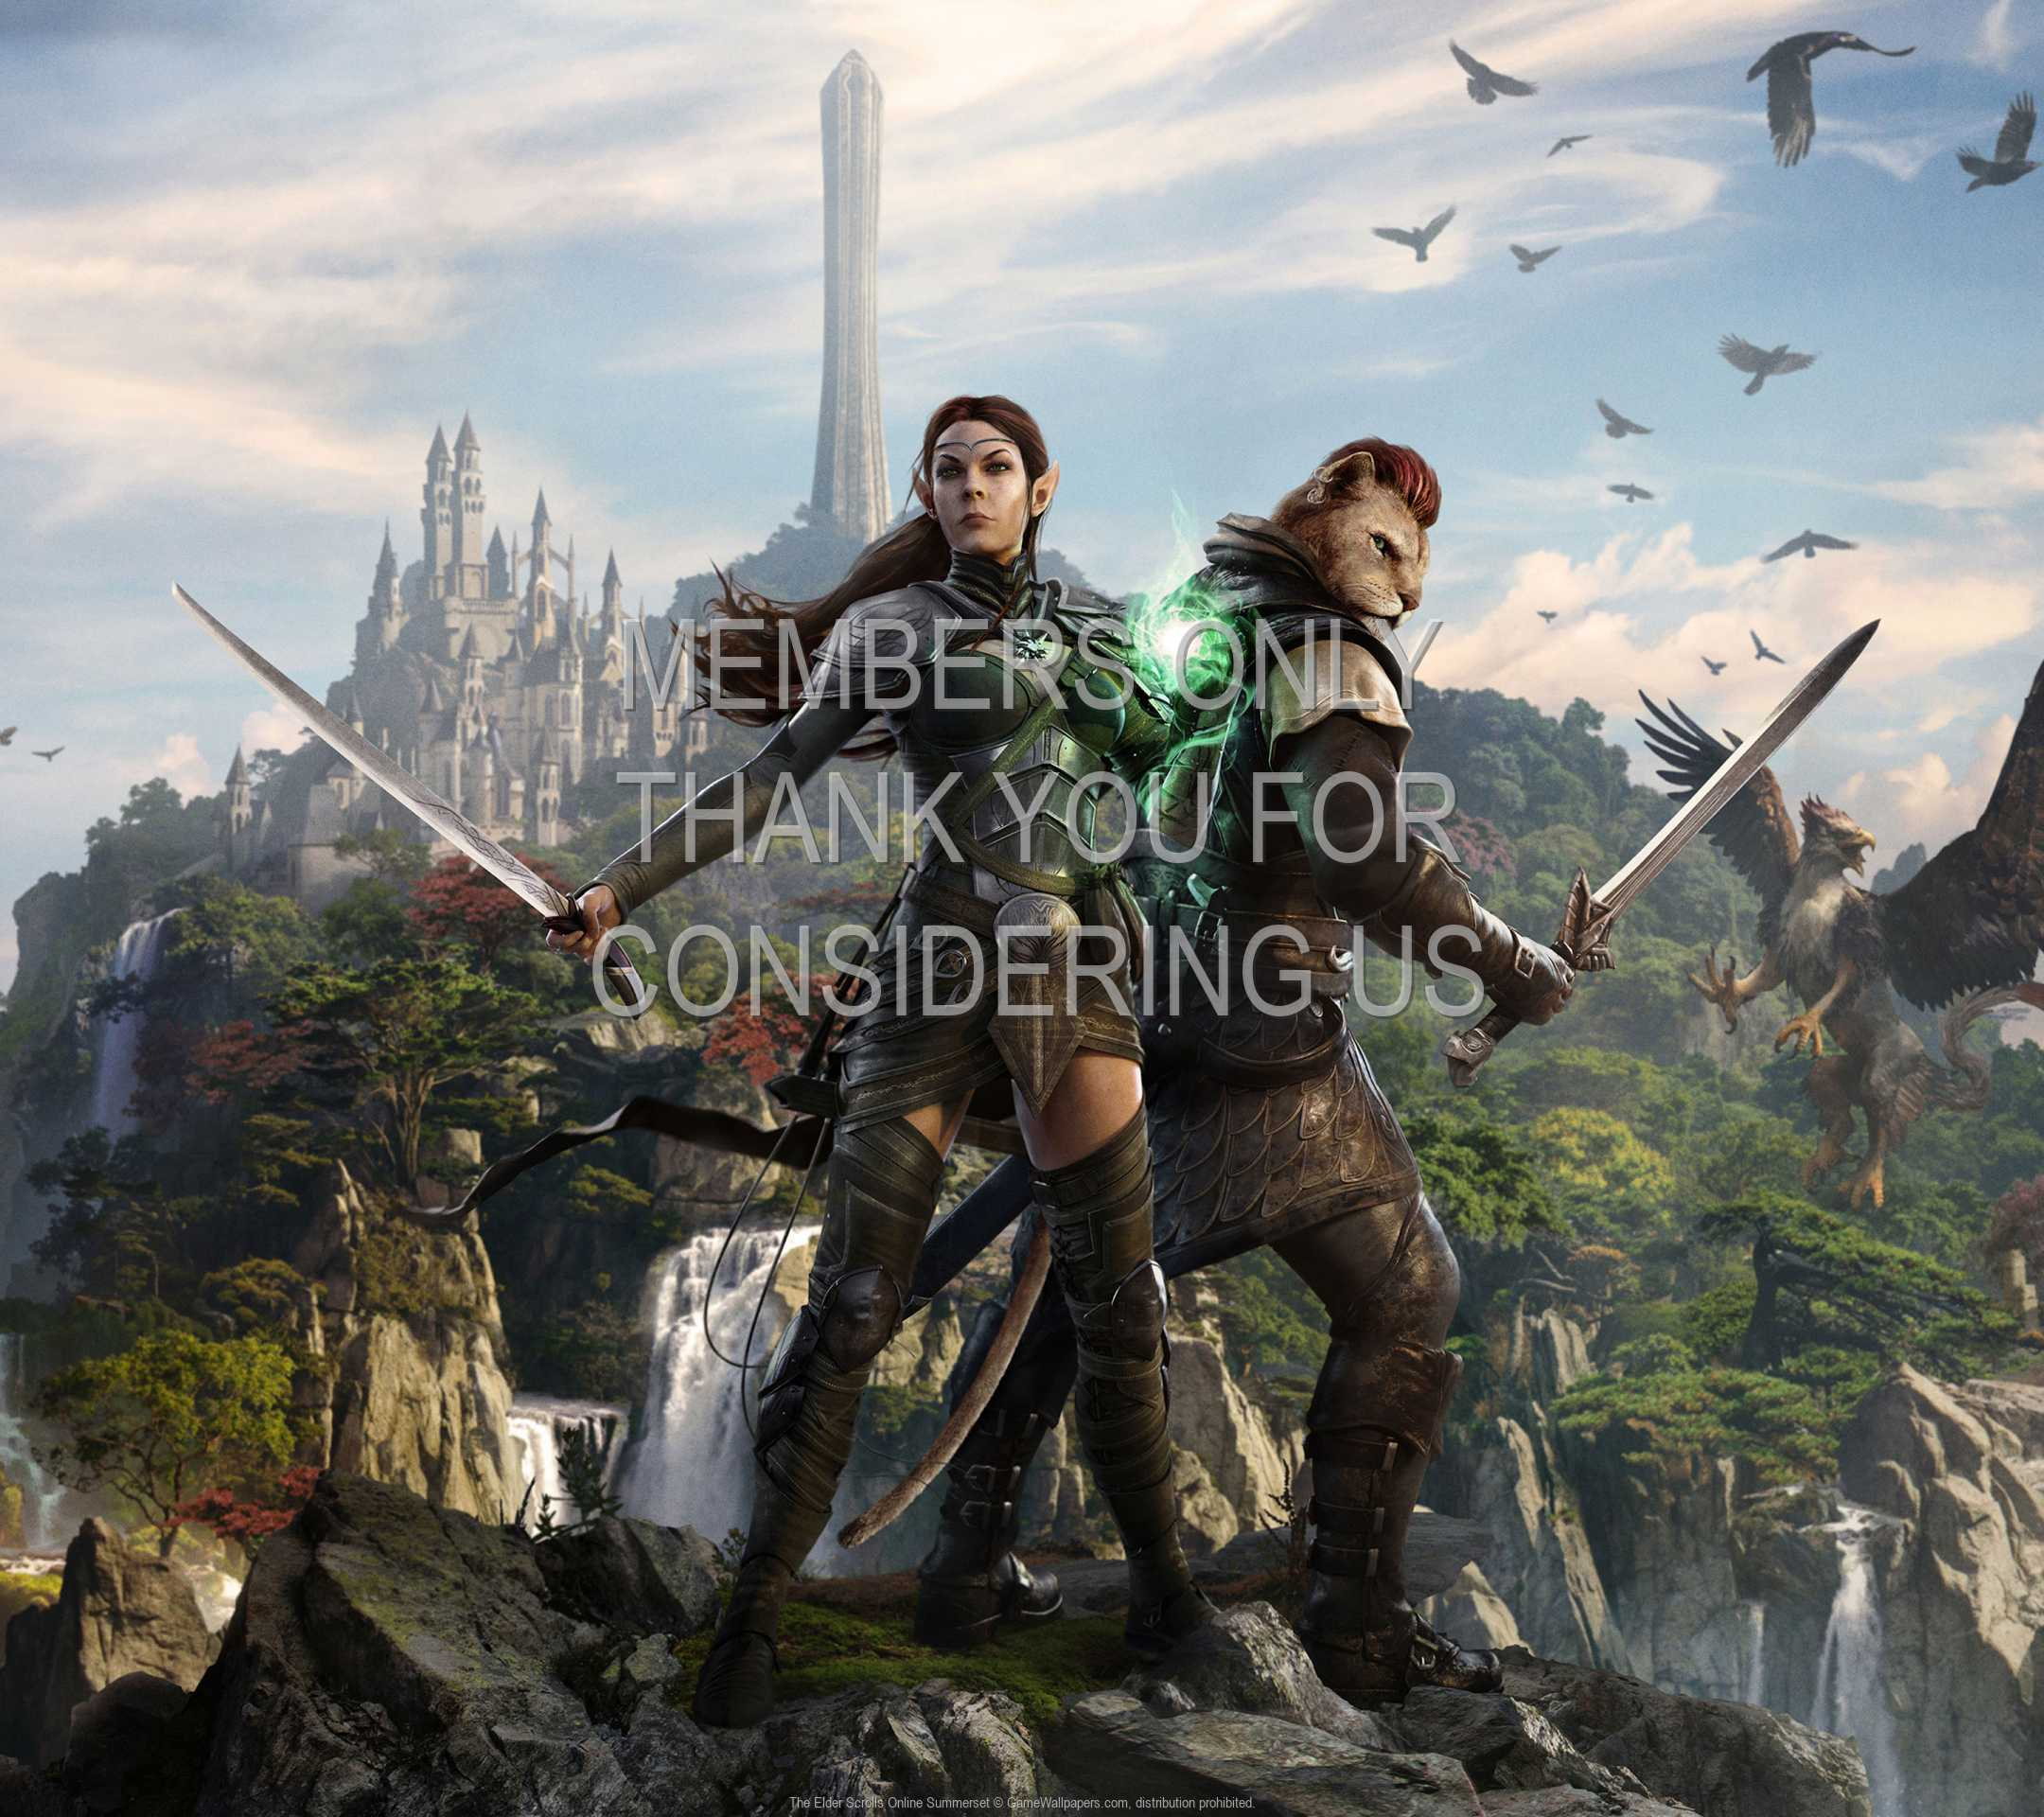 The Elder Scrolls Online: Summerset 1080p Horizontal Mobile wallpaper or background 01